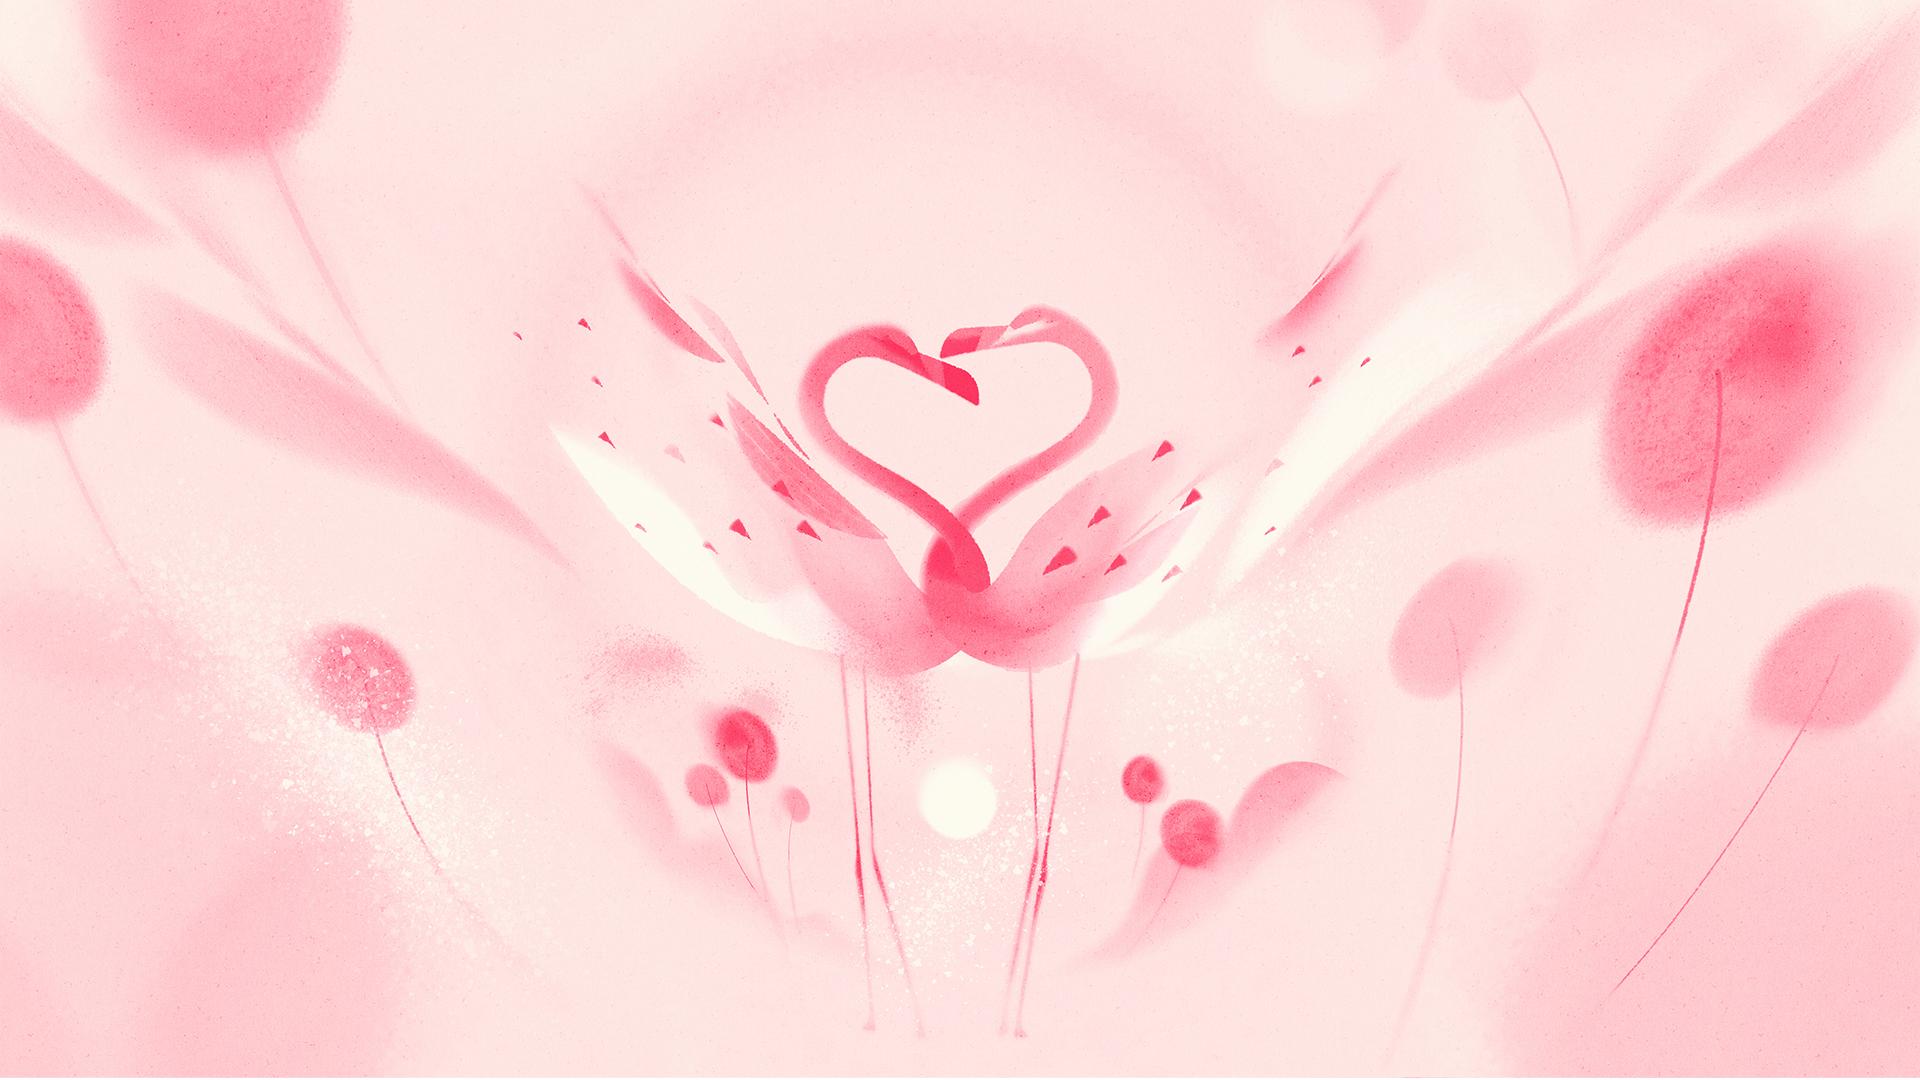 CNN17_01_Colorscope_s100_Pink_Flamingo.jpg